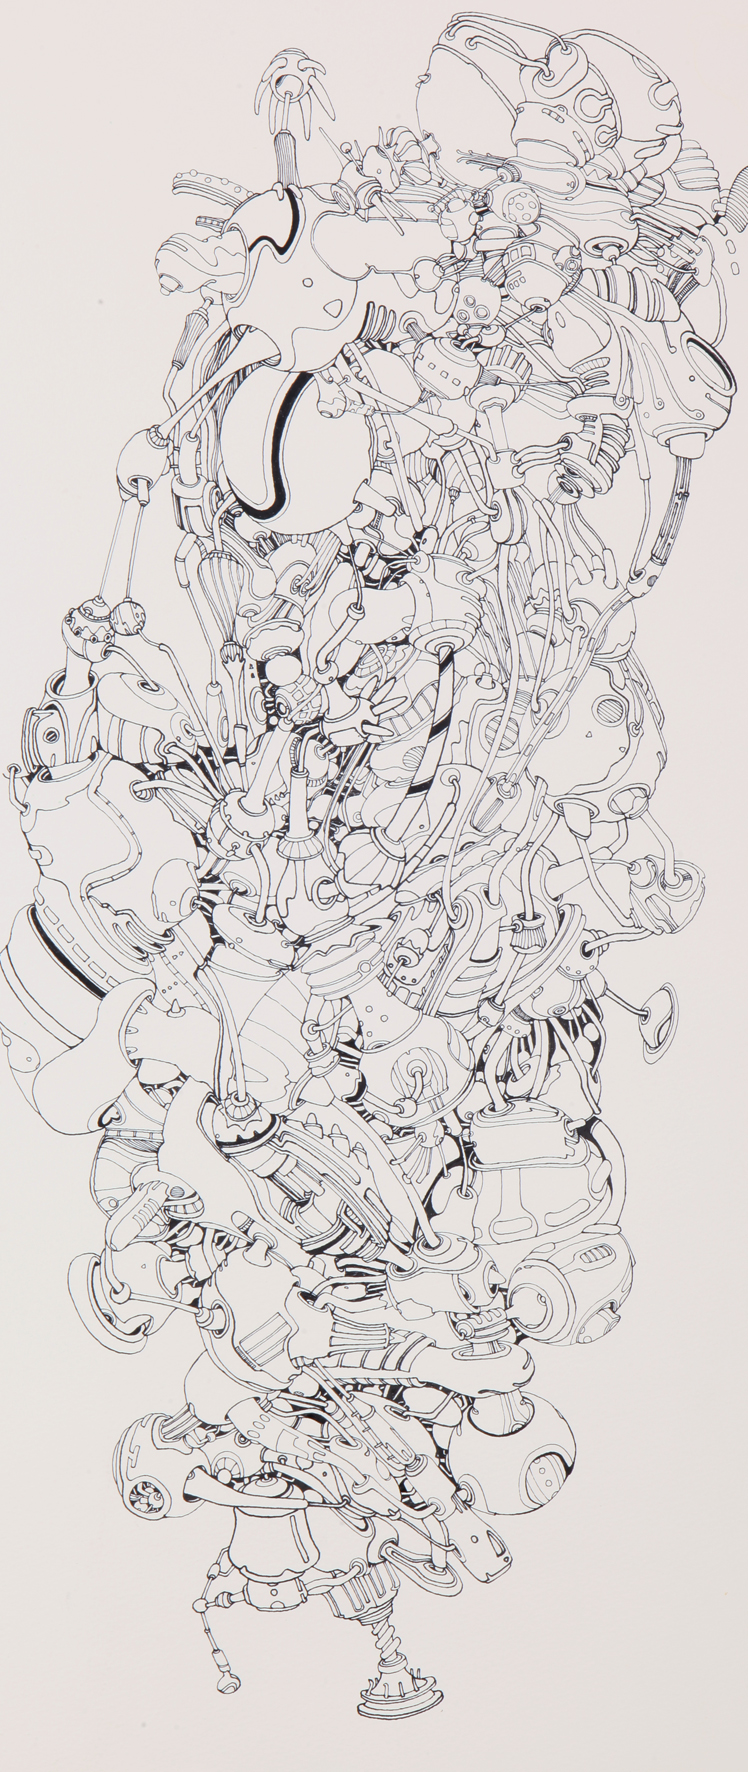 Strange planet 7 ink on paper 60x100cm 2010.jpg